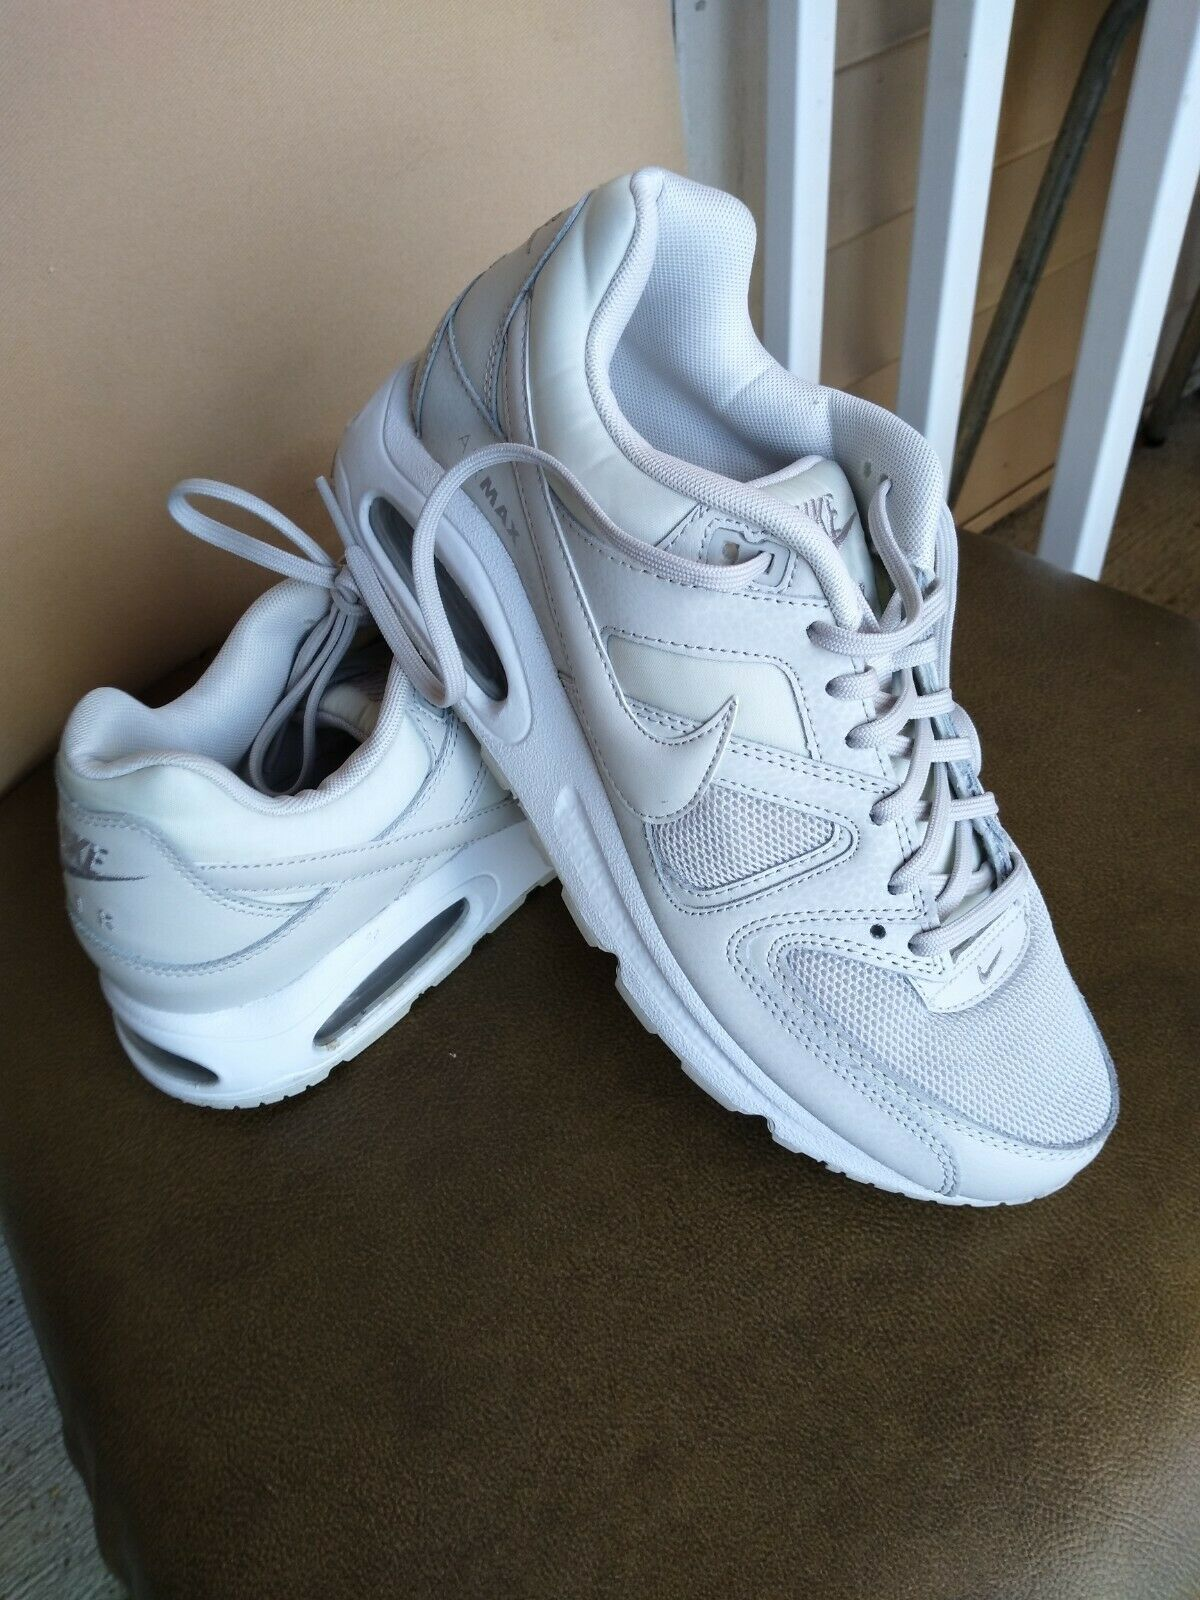 Womens Nike Air Max Command 397690 018 Light Bone Size 6.5